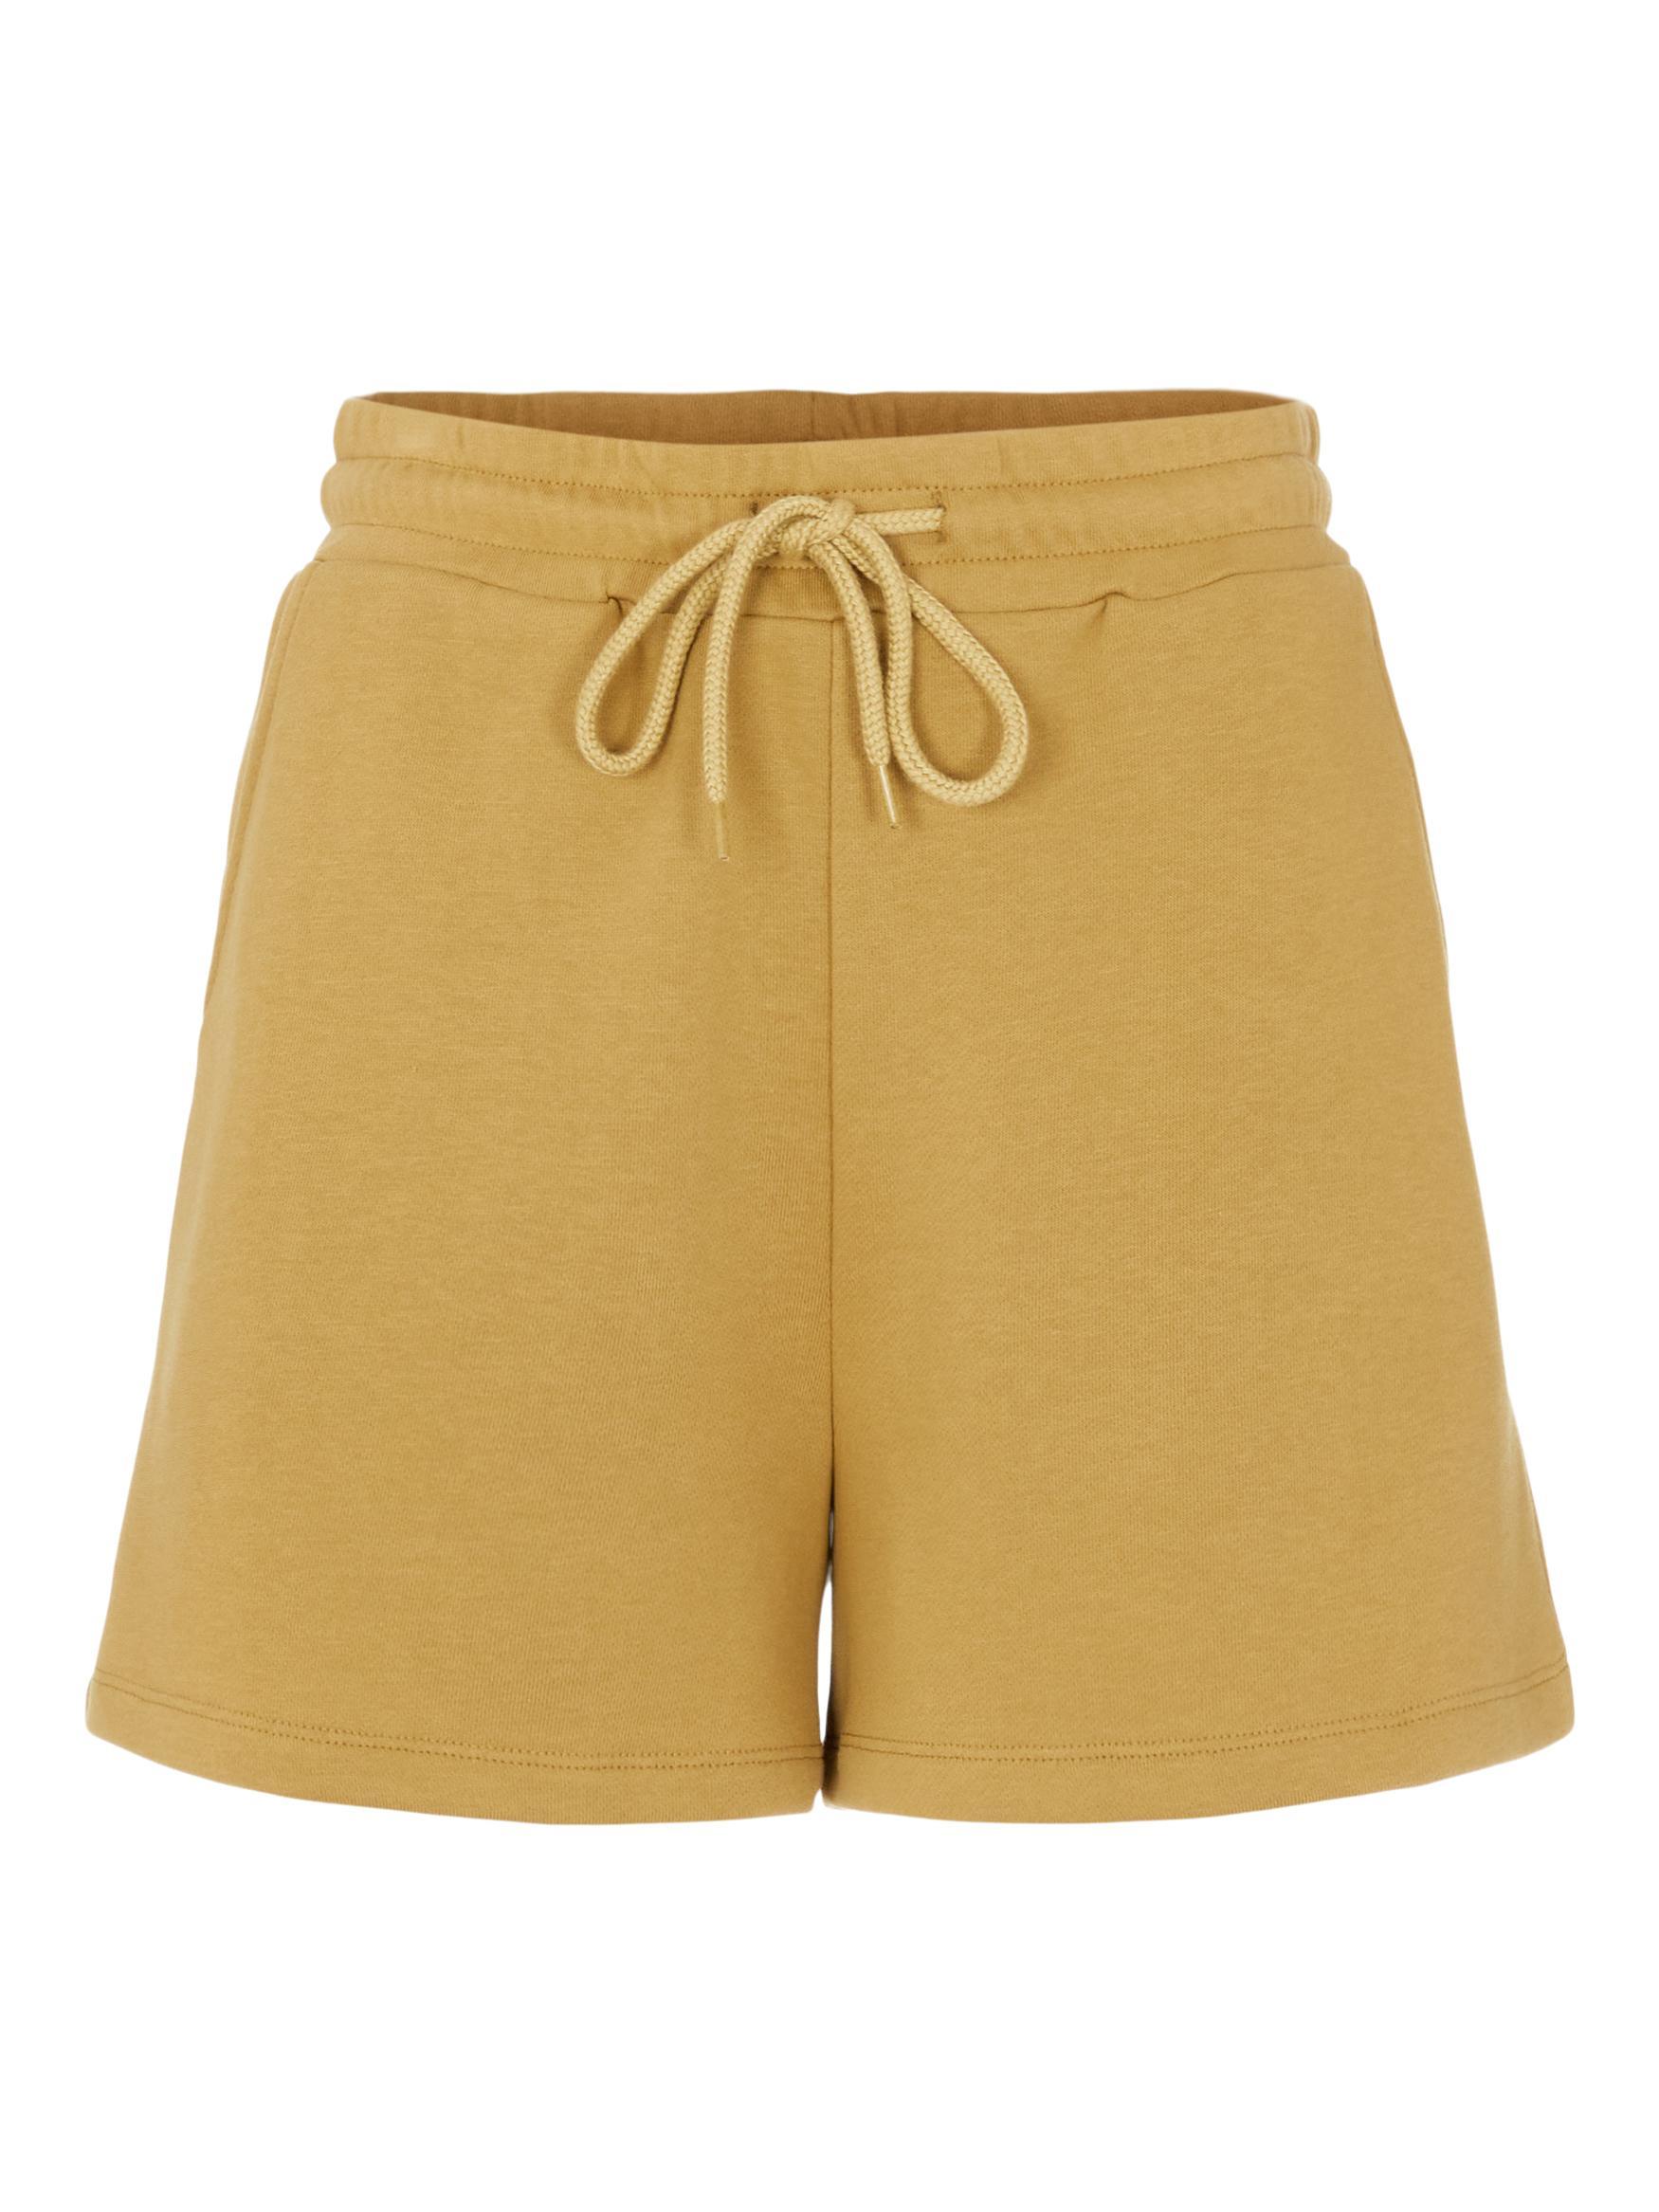 Pieces Chilli Summer shorts, khaki, medium